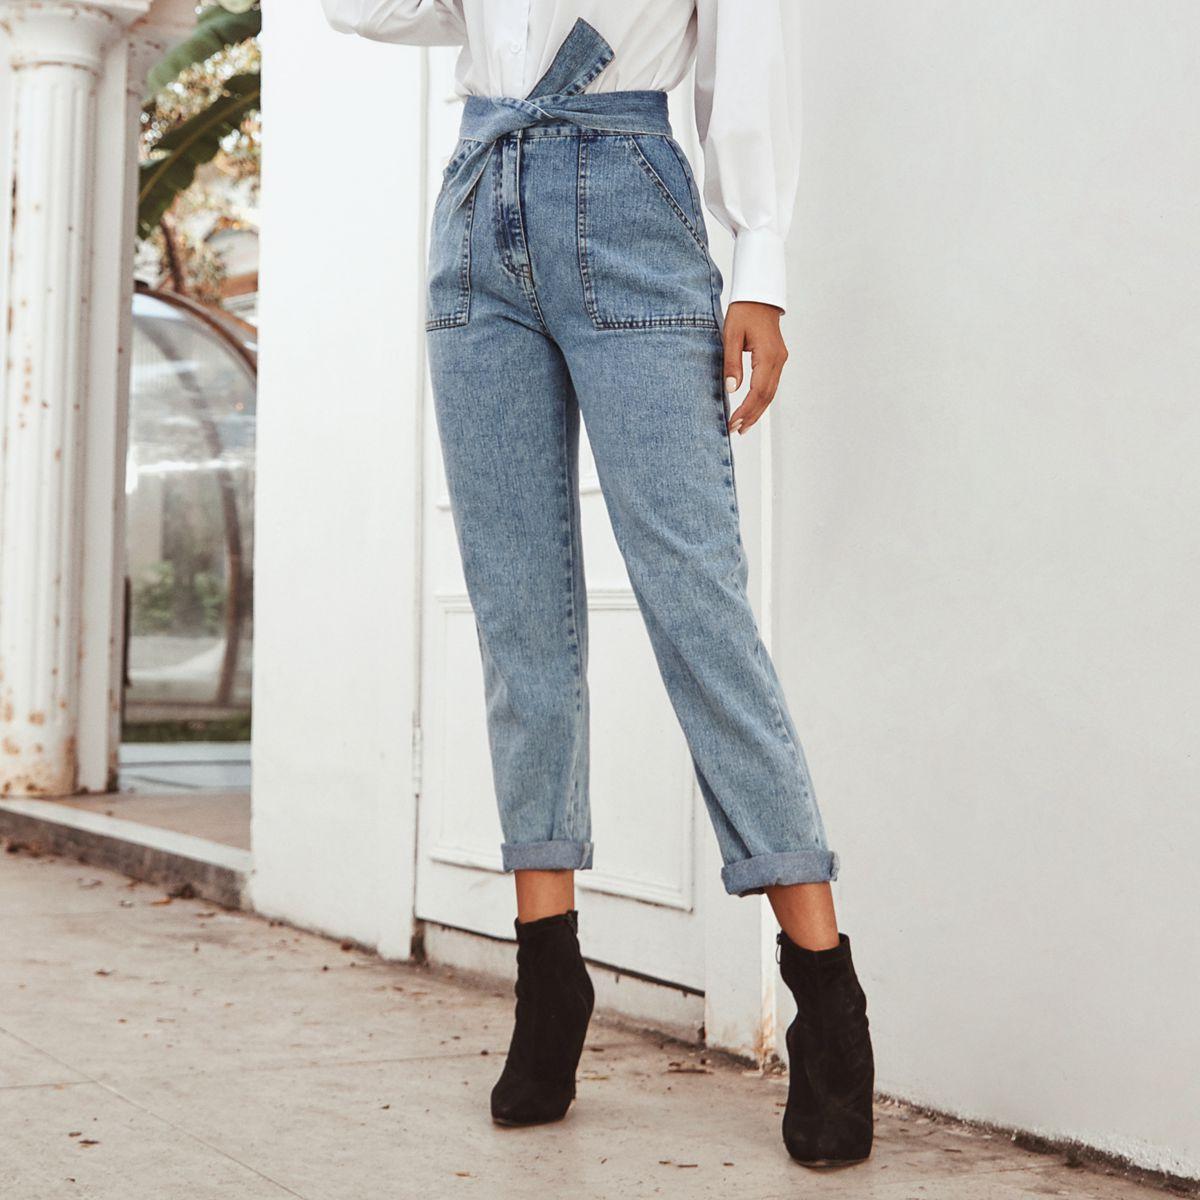 Women Vintage High Waist Jeans Fashion Boyfriends Style Denim Pants